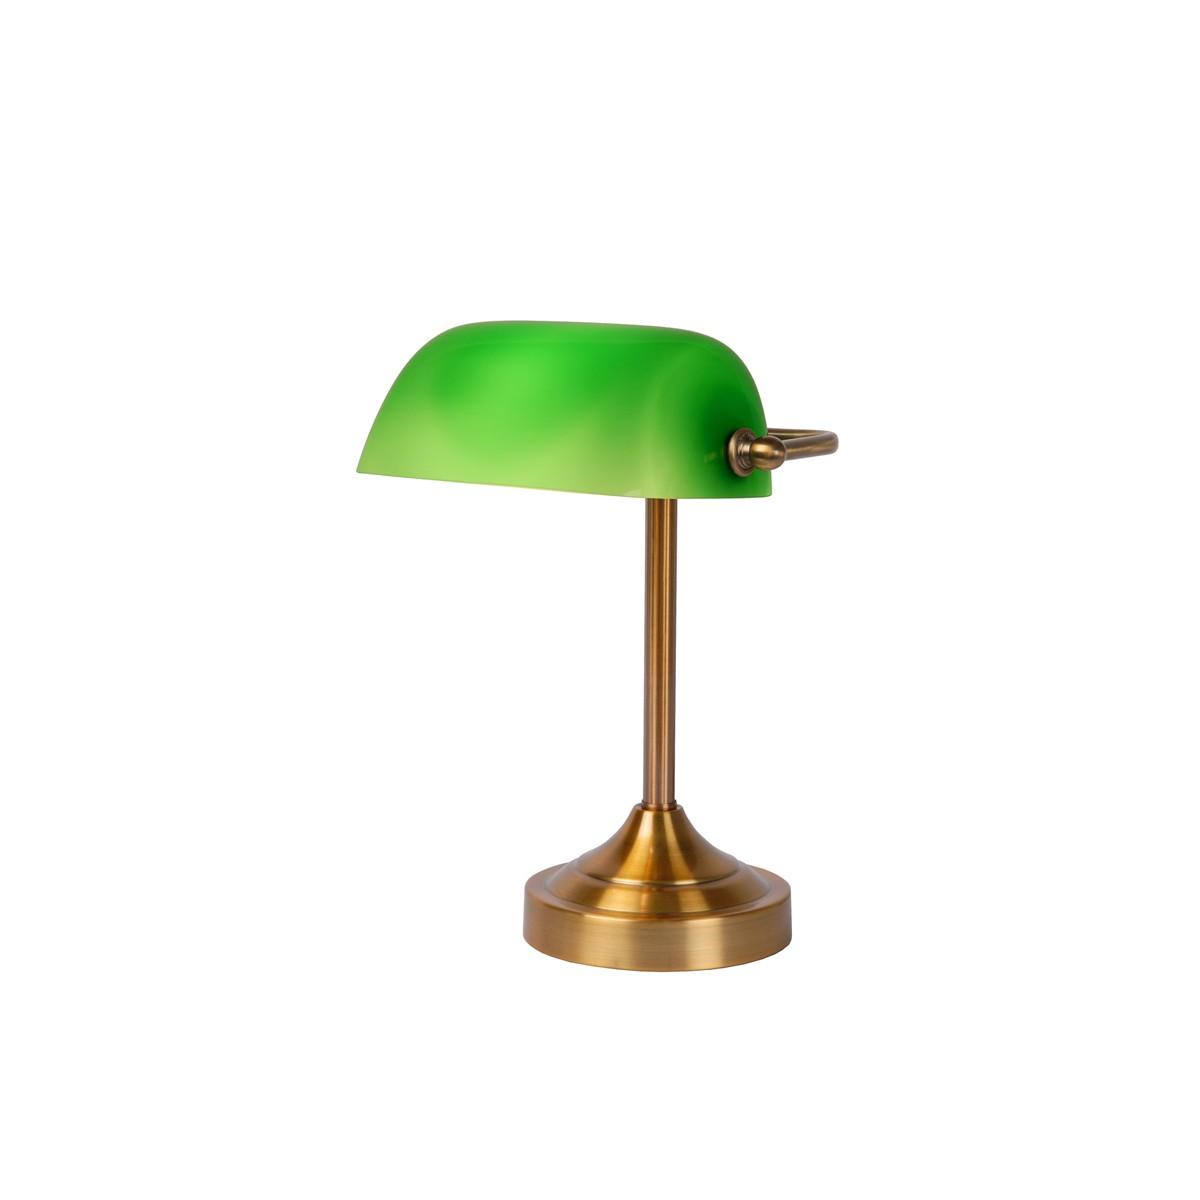 Lucide Banker Lamp E14 W22cm H30cm Glass zielona/ Bronze 17504/01/03